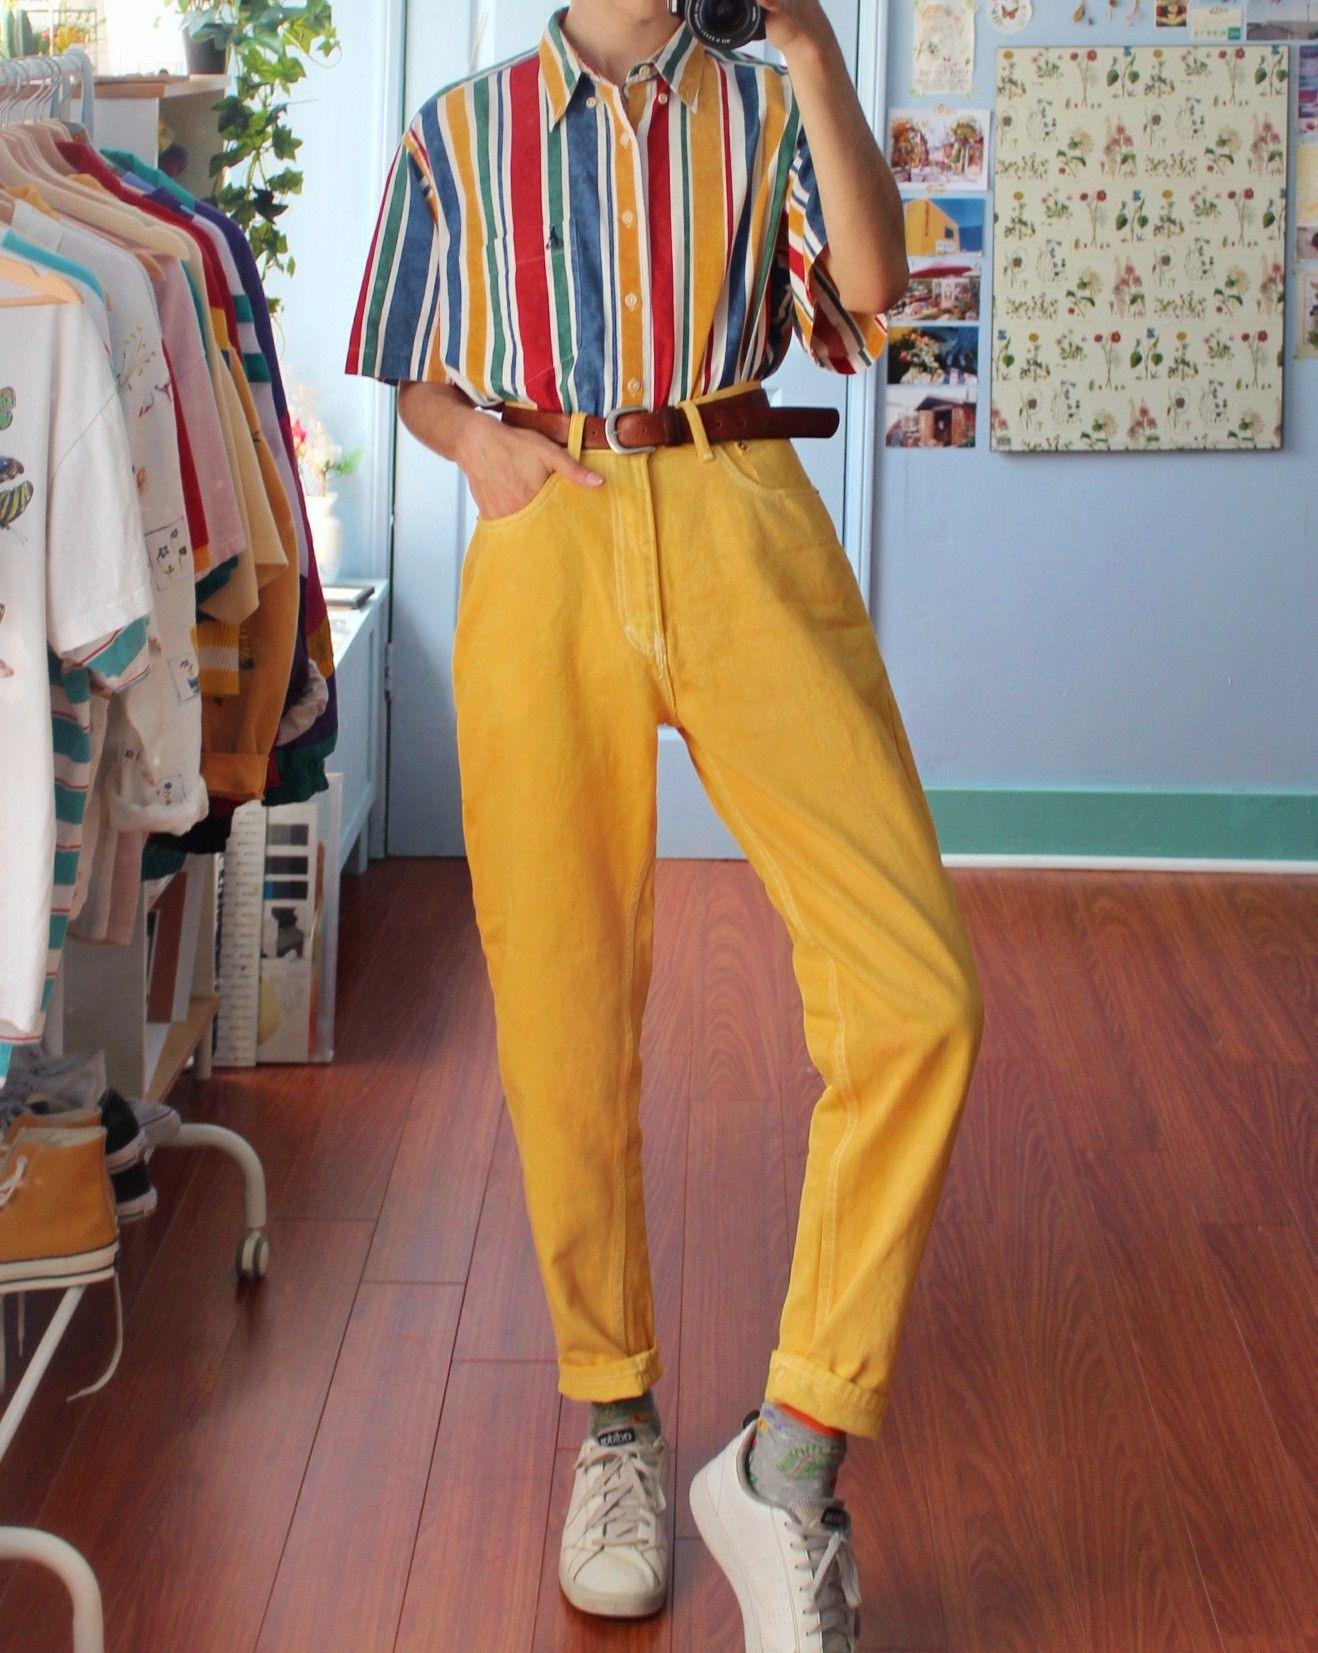 Crisheeta Retro Outfits Aesthetic Clothes Clothes